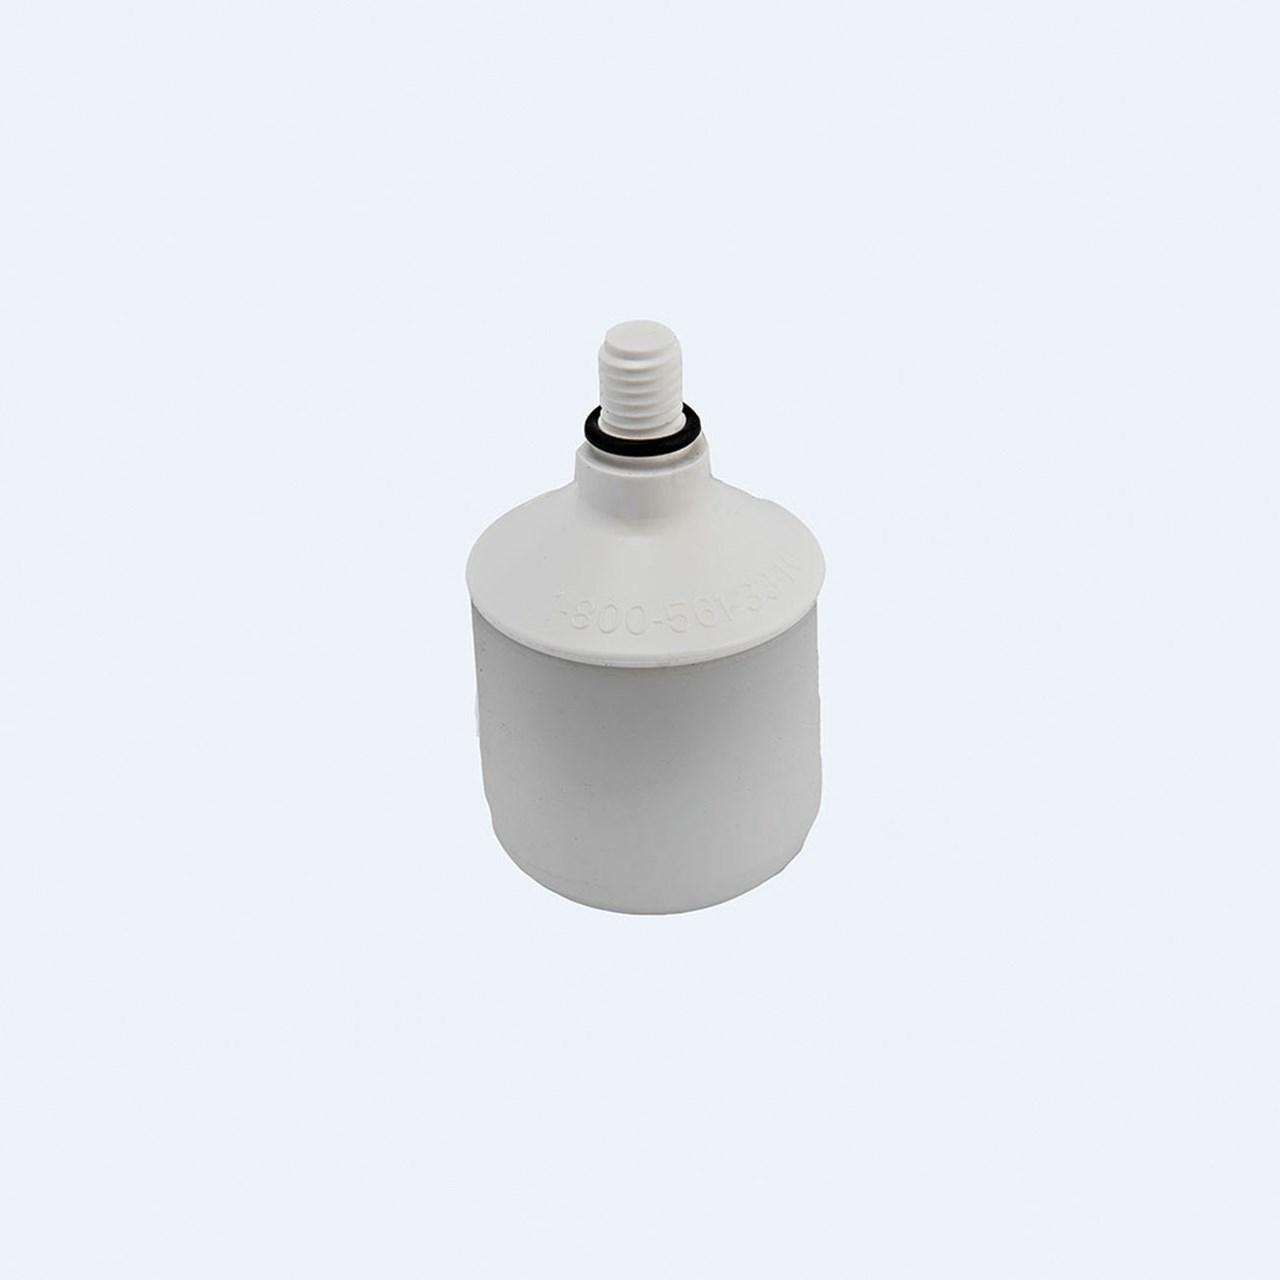 Ambutech 8mm Threaded Roller Marshmallow Tip - White